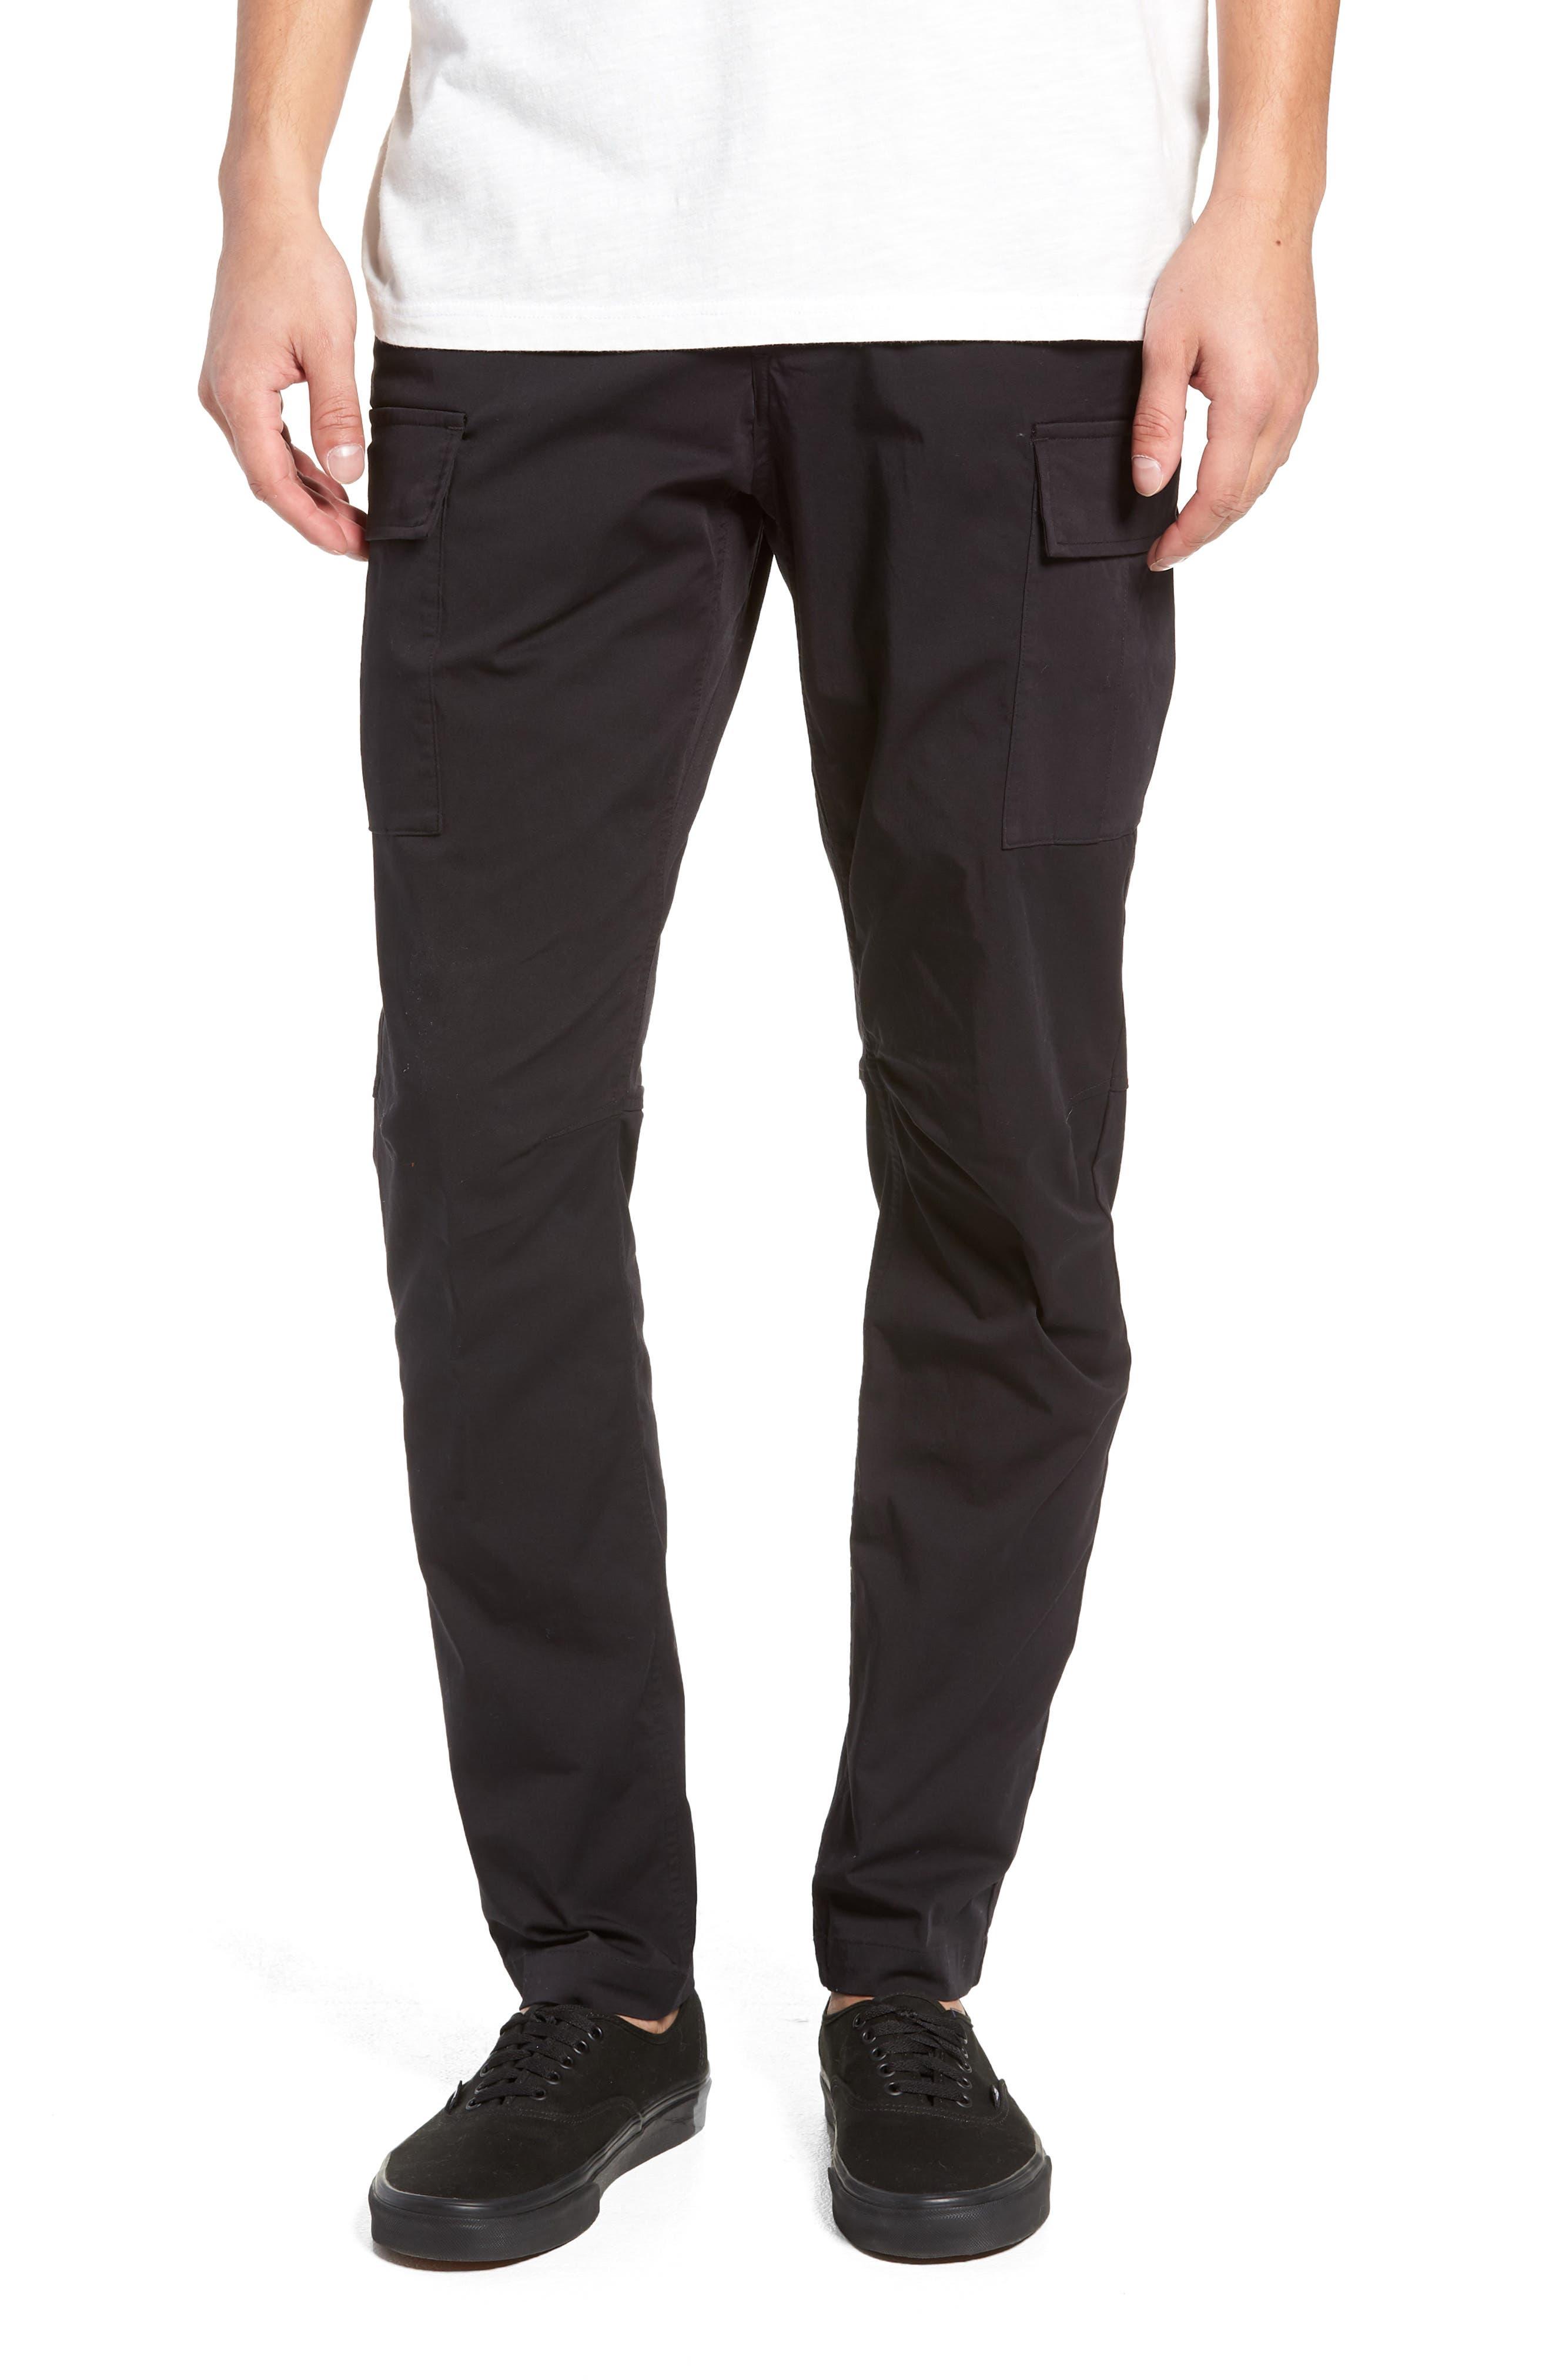 Cordura Slim Fit Cargo Pants,                             Main thumbnail 1, color,                             BLACK